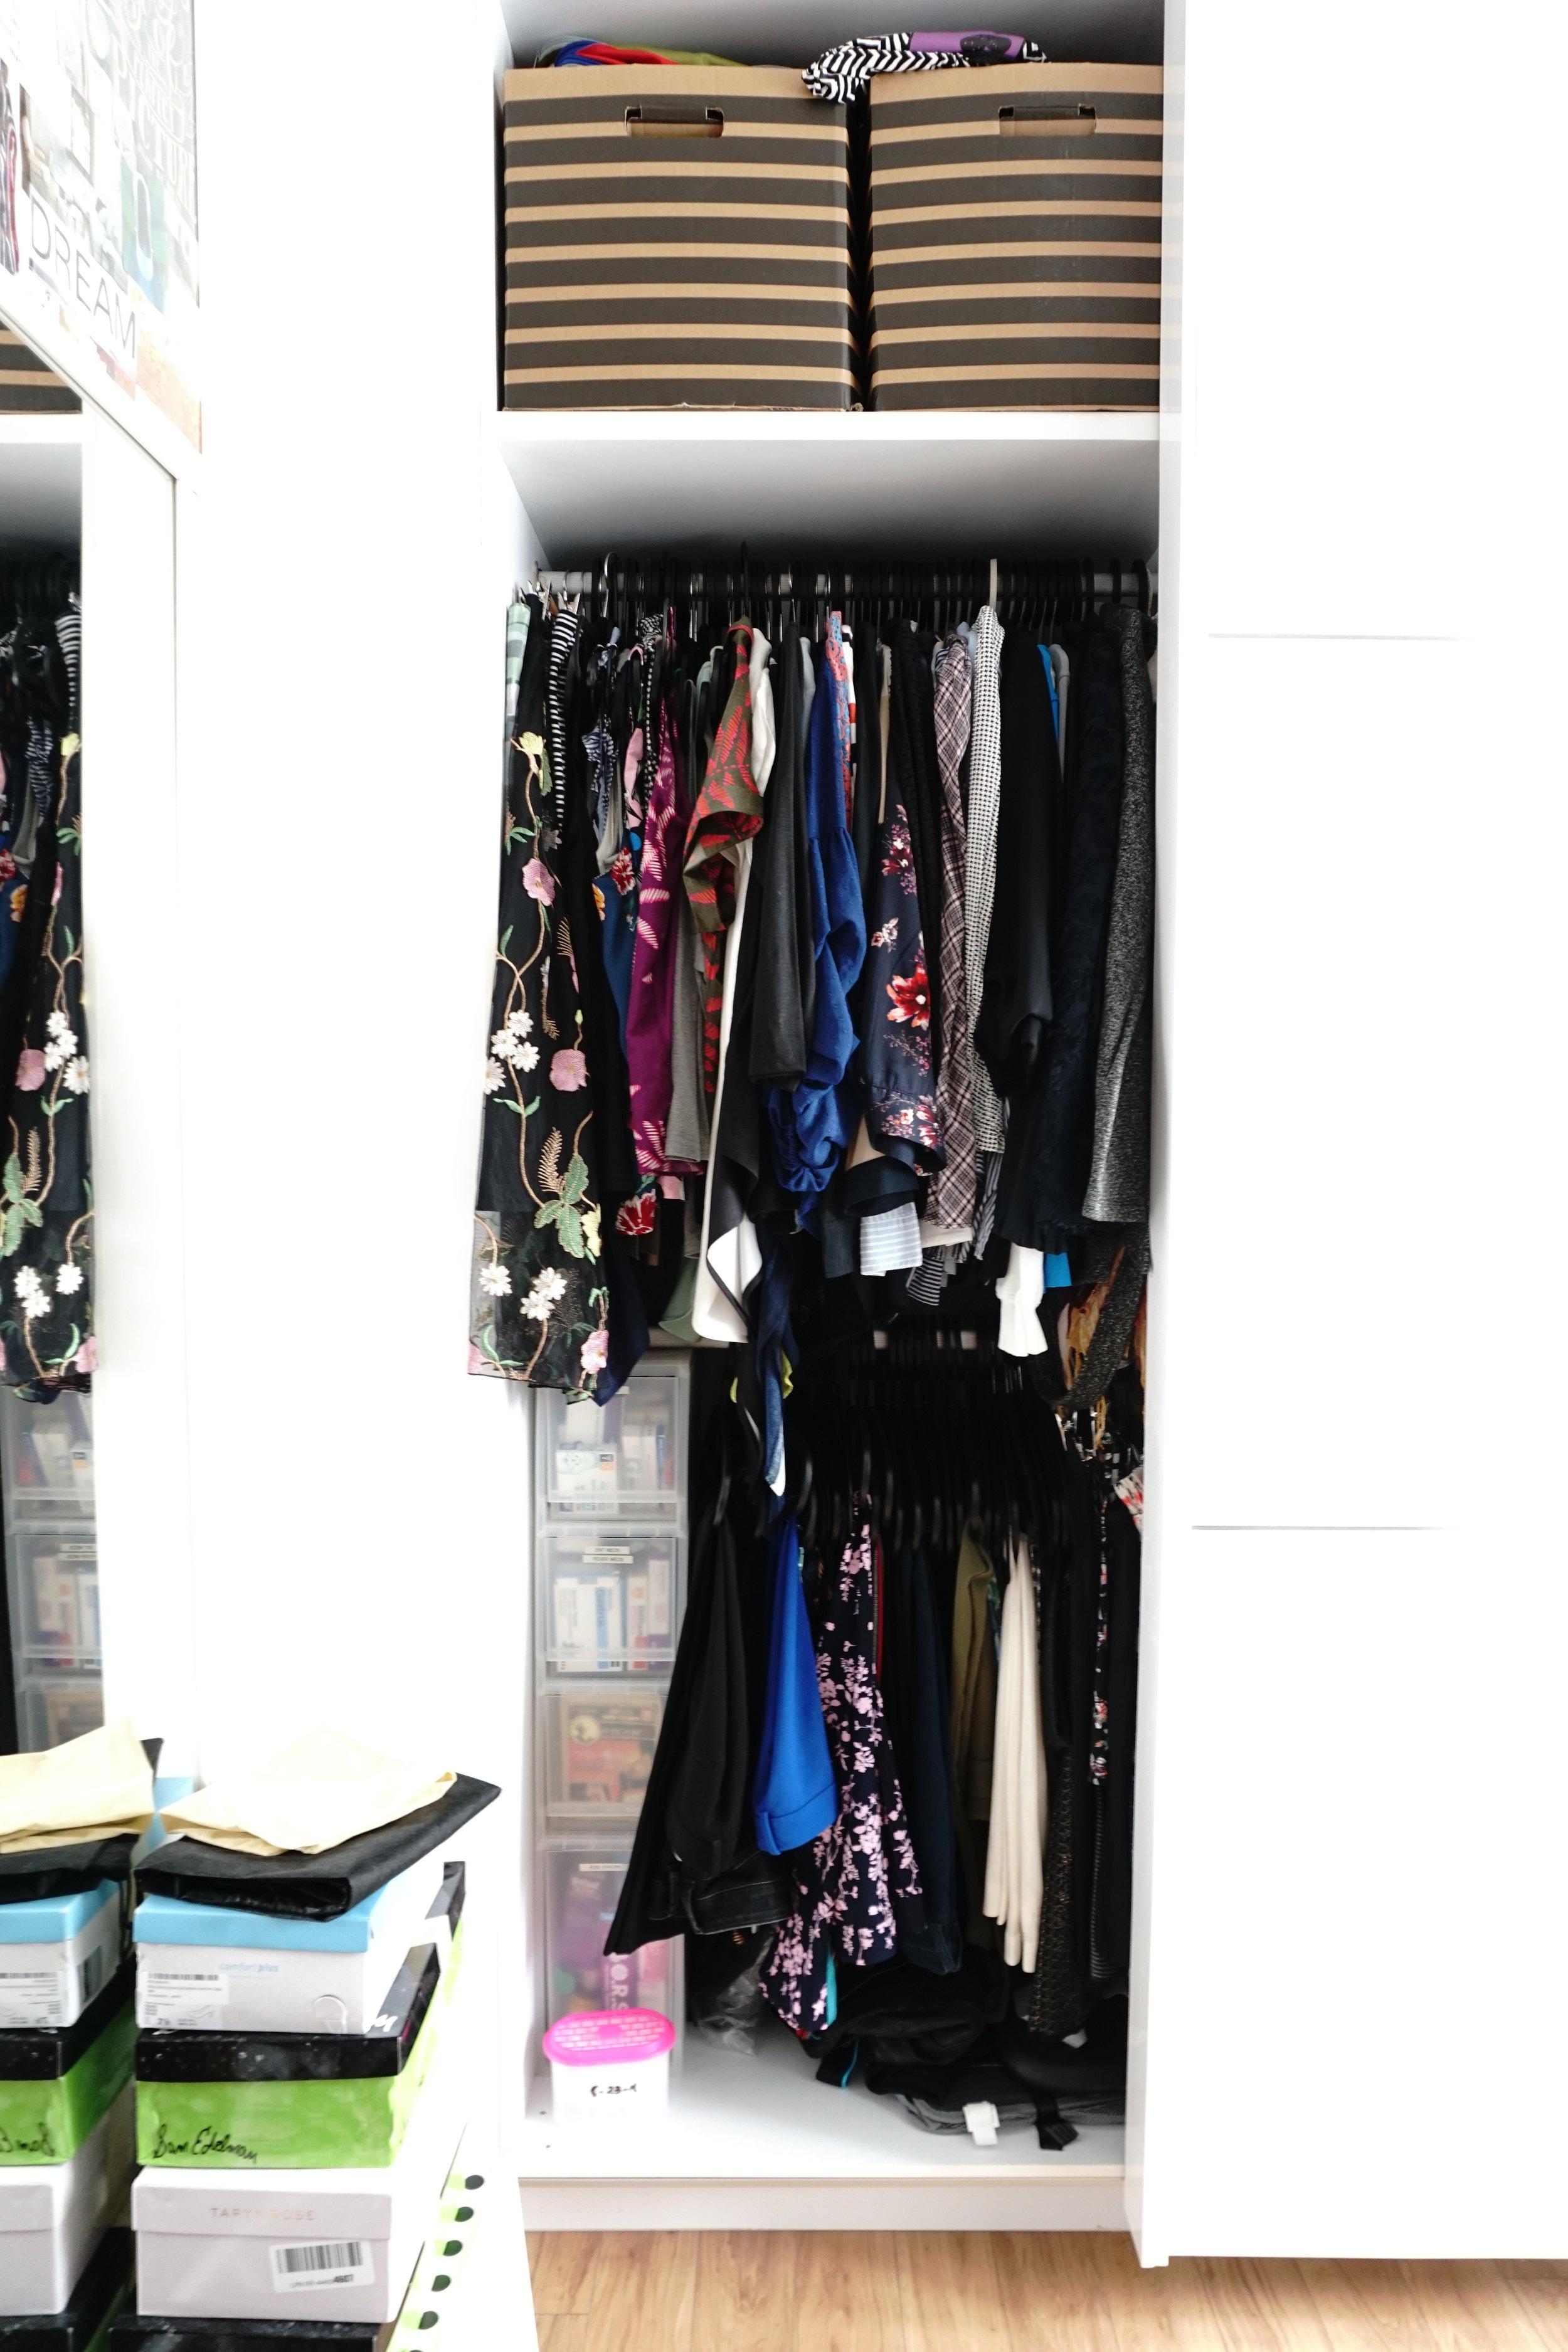 closet1_before.JPG